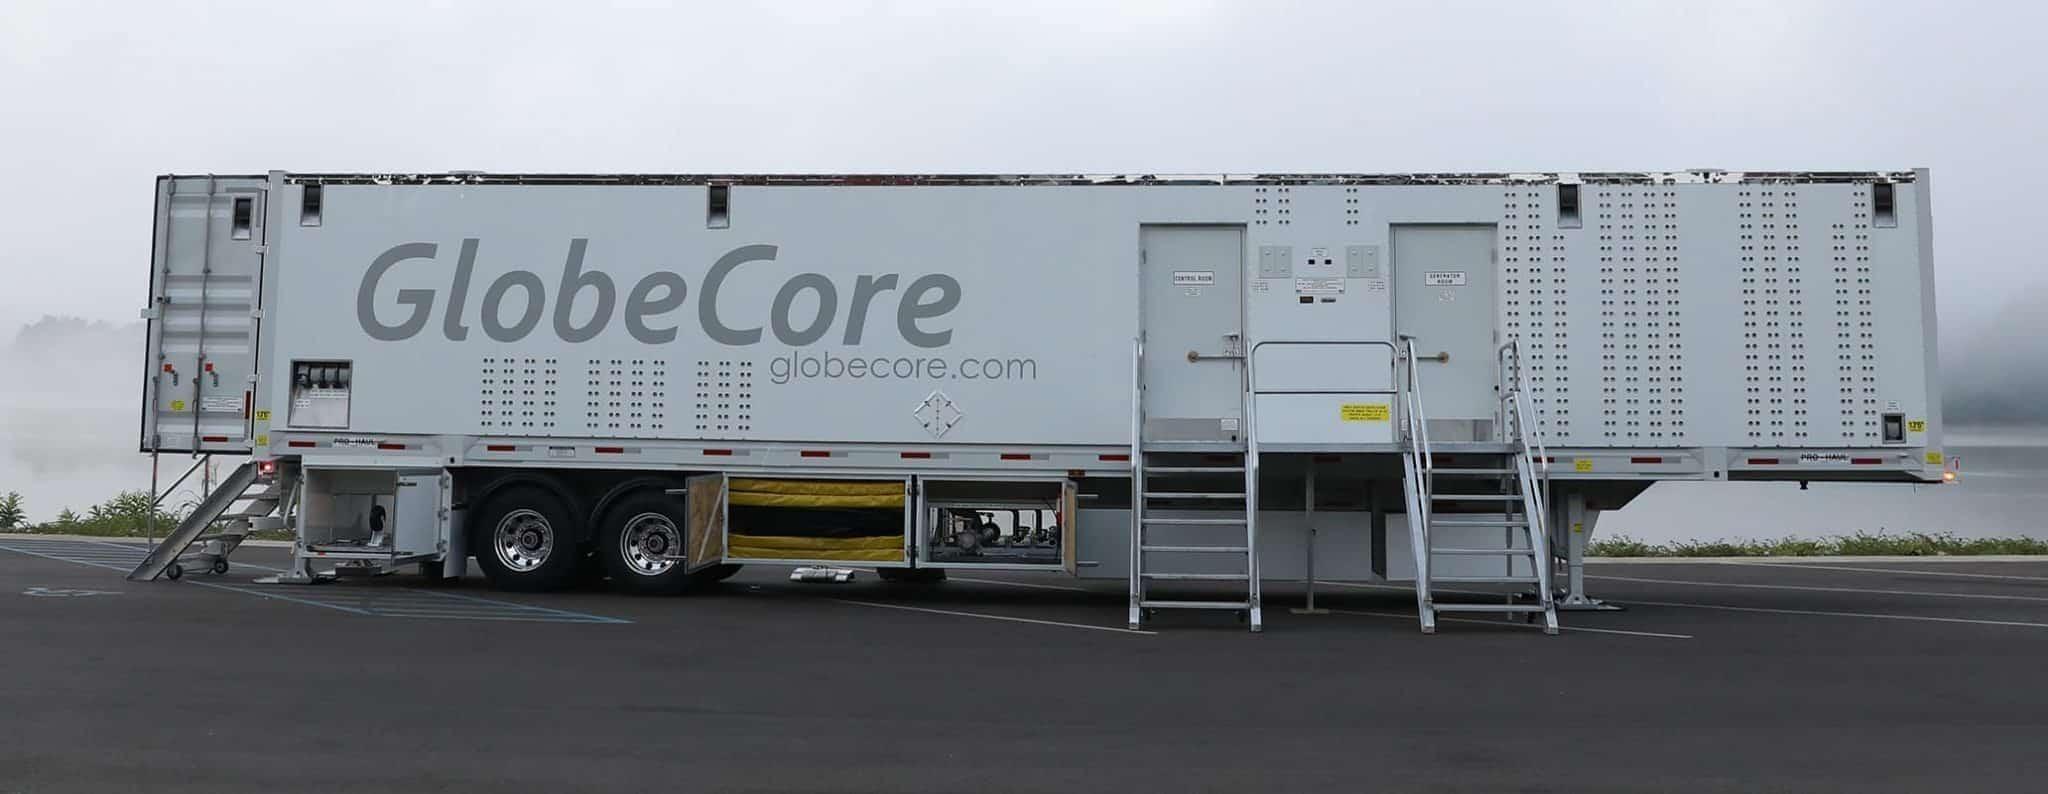 globecore-607